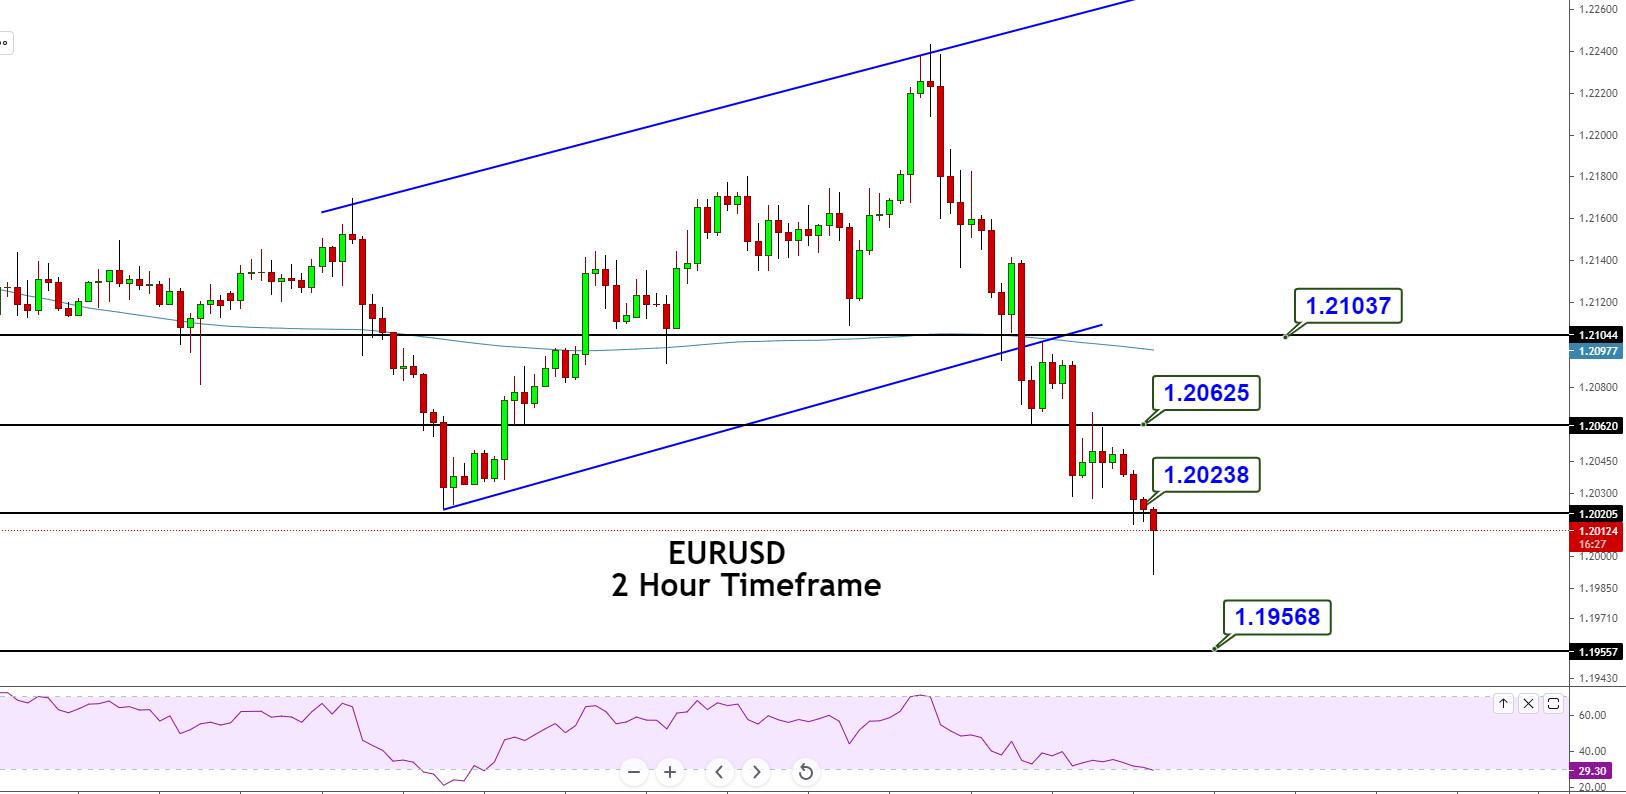 EUR/USD Violates Upward Channel – Quick Sell Signal!